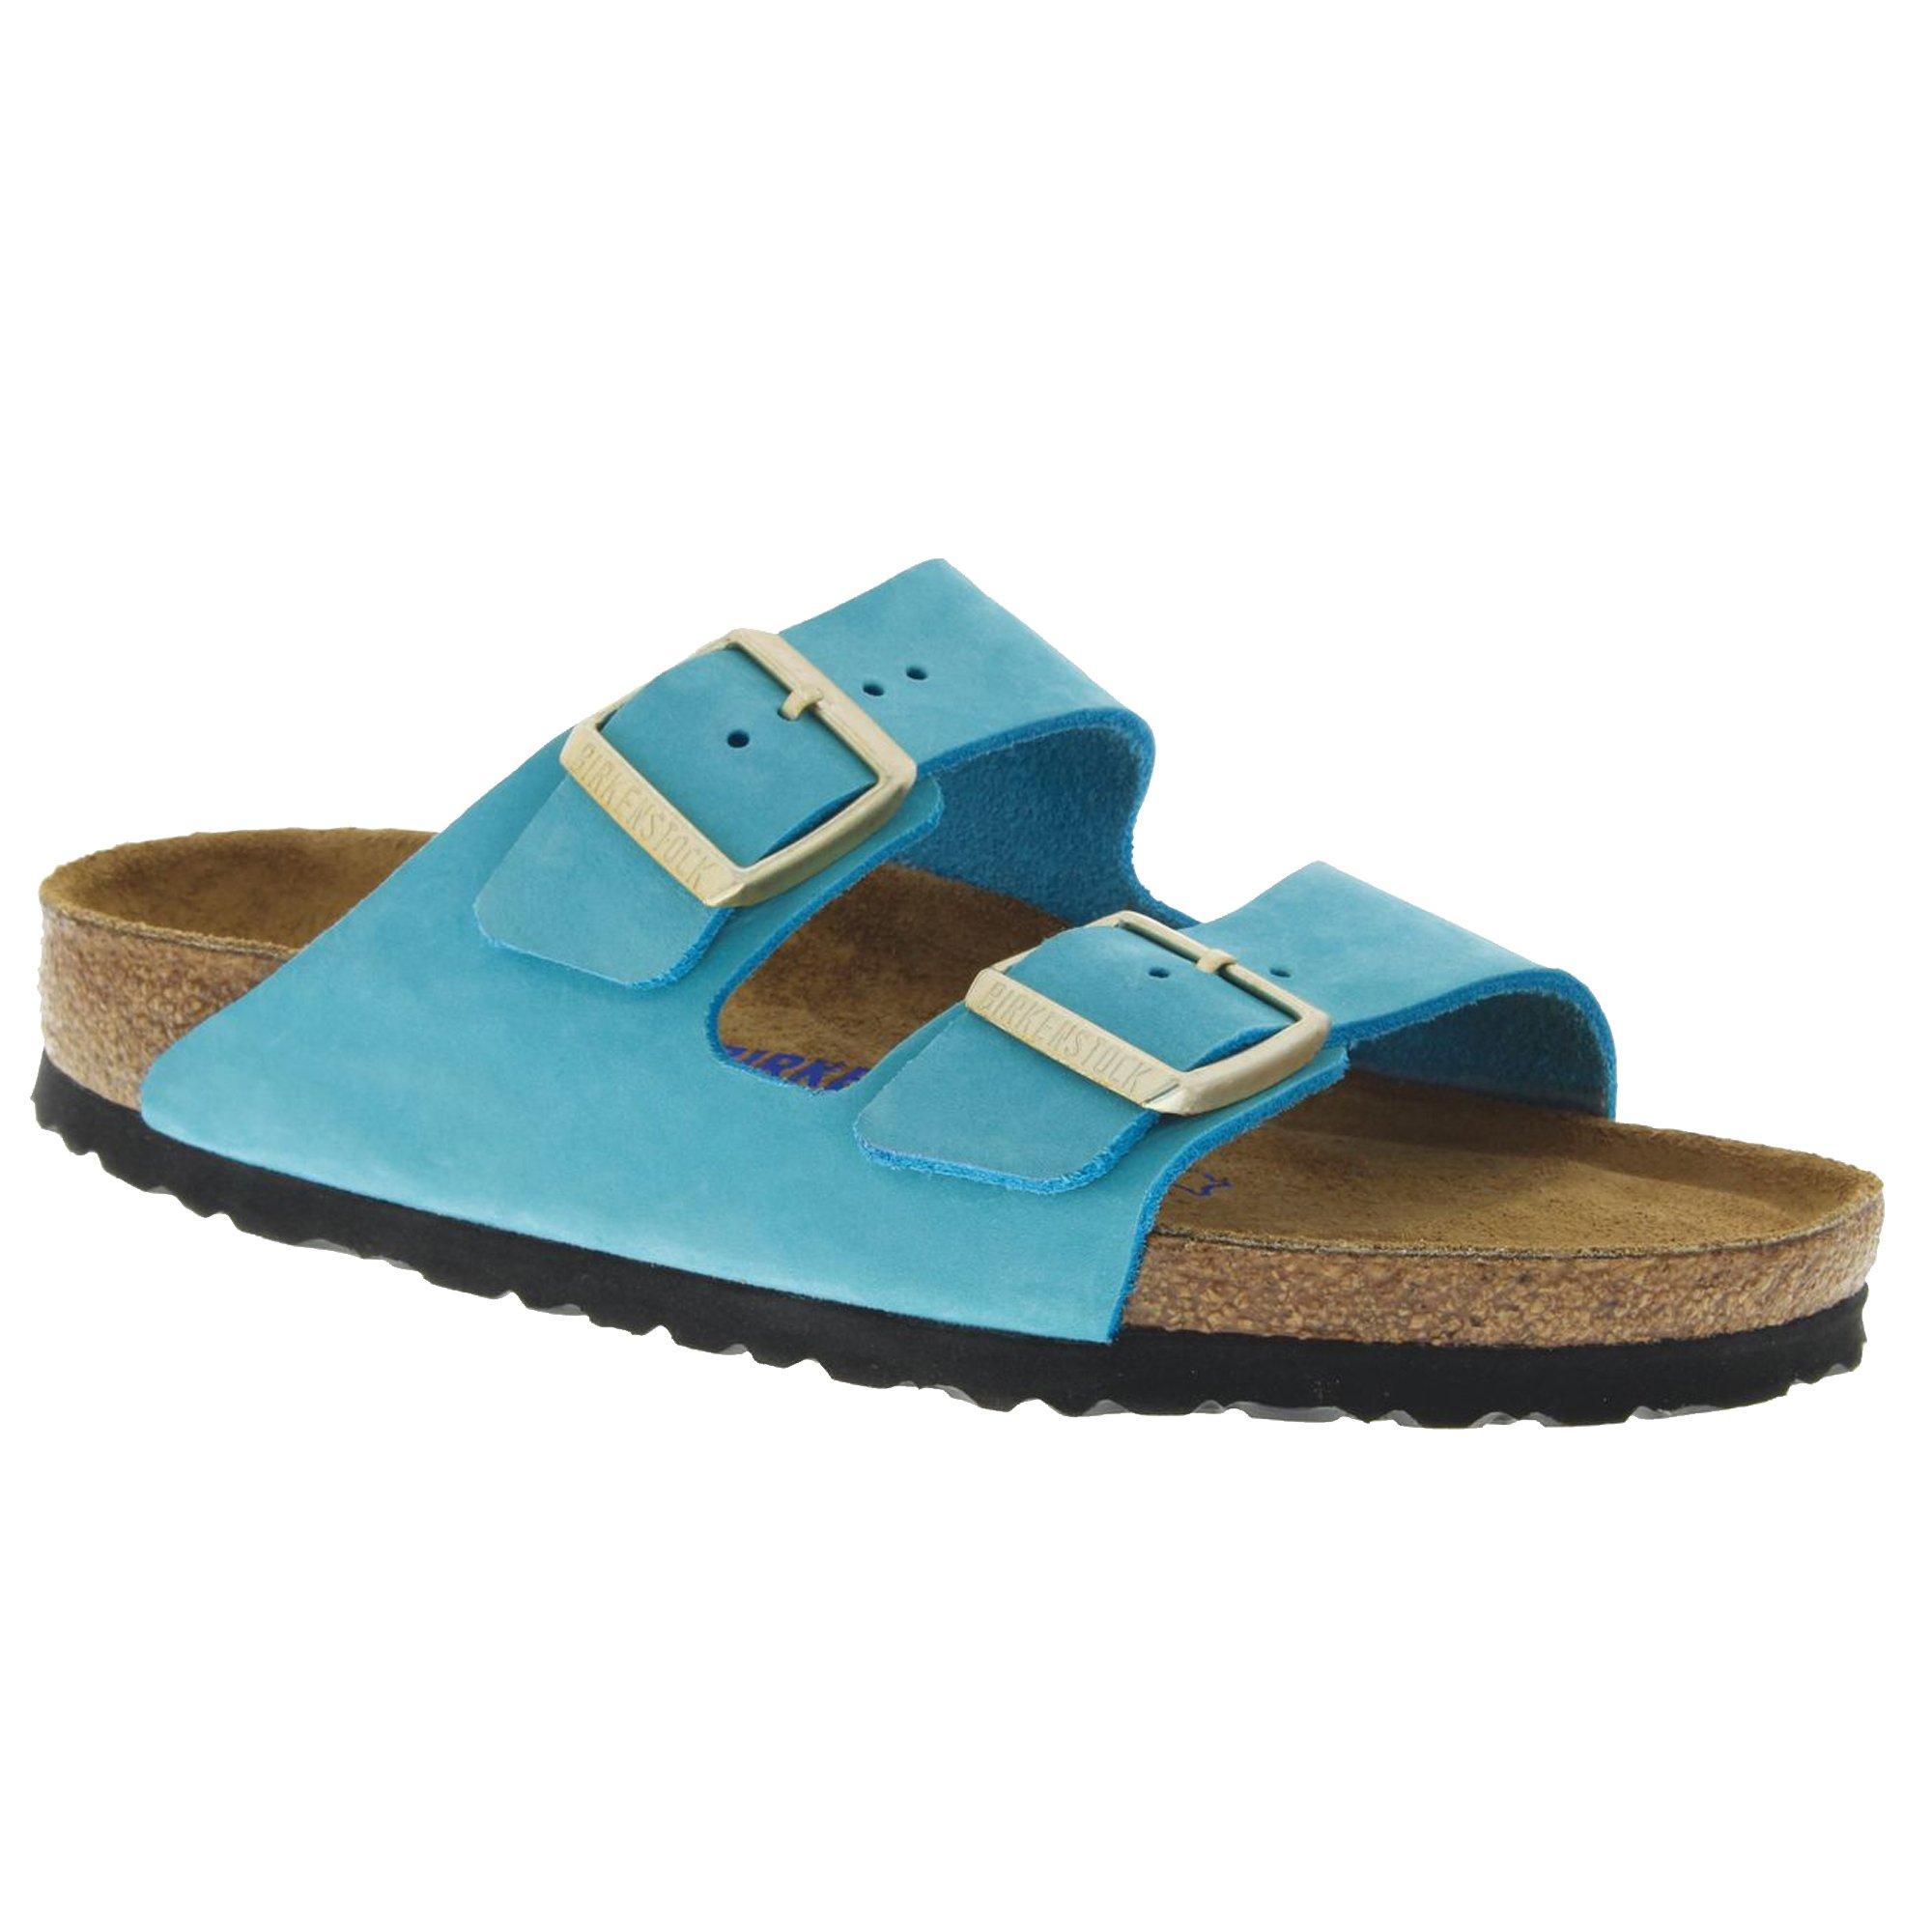 Birkenstock Arizona Soft Footbed Turquoise Nubuck Sandal 40 (US Women's 9-9.5)